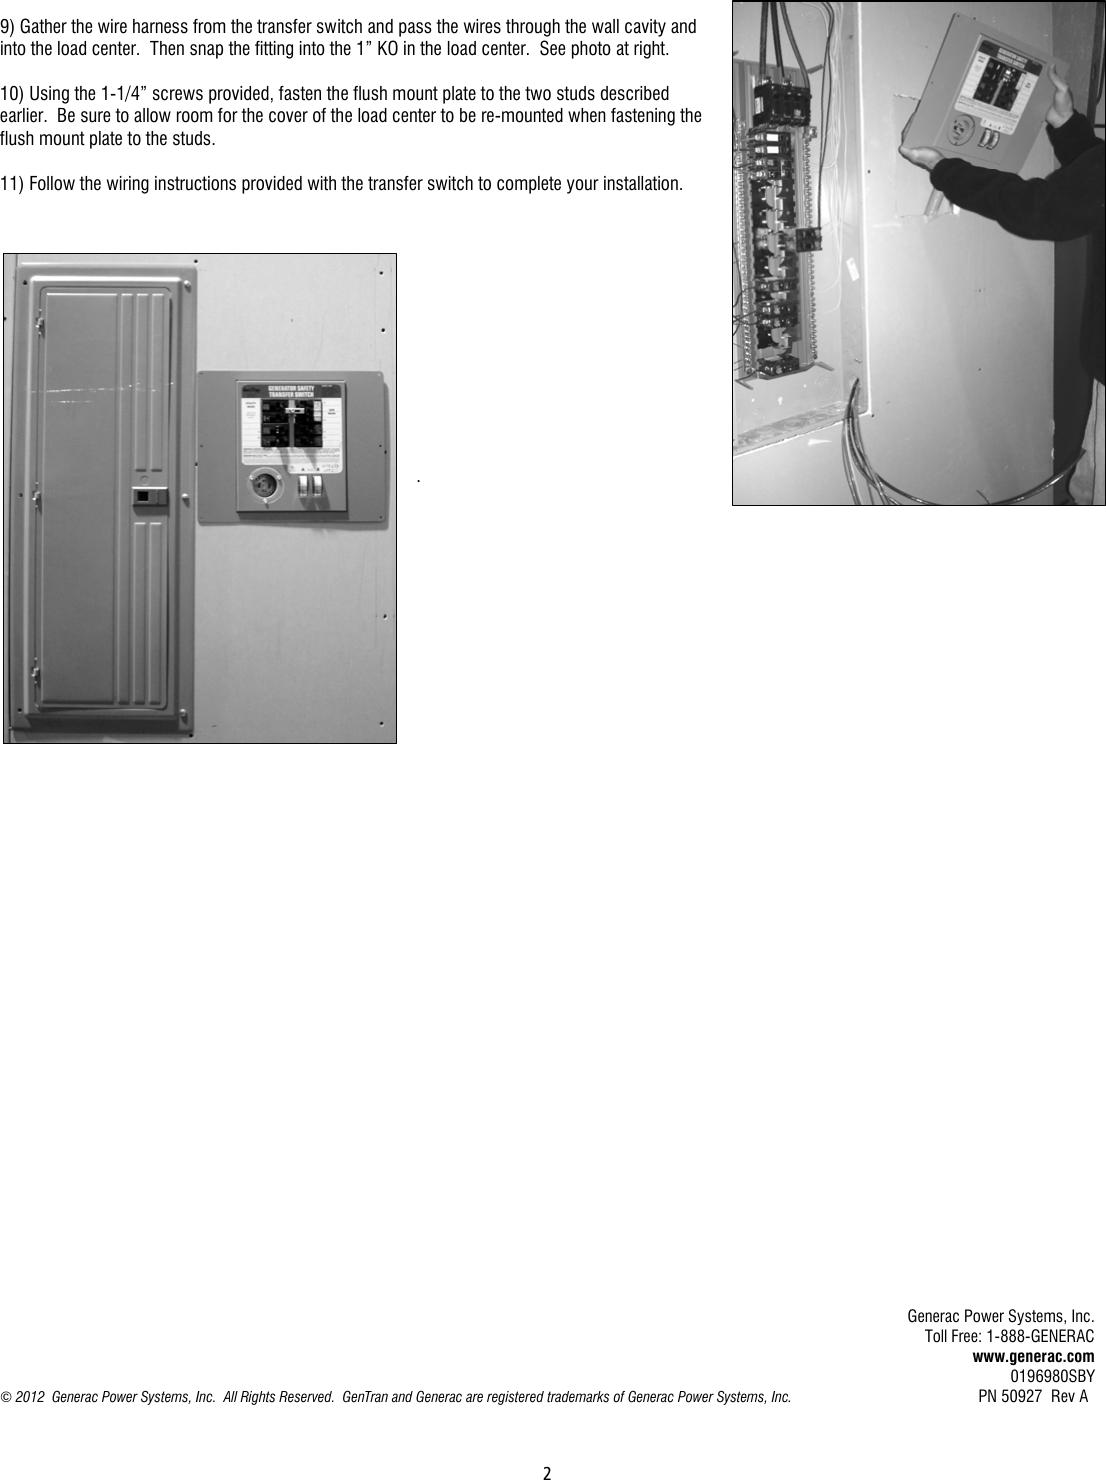 Generac6383 Installmanualreva Eng 66328 2 Generac 6383 Instructions Wiring Harness Page Of 6